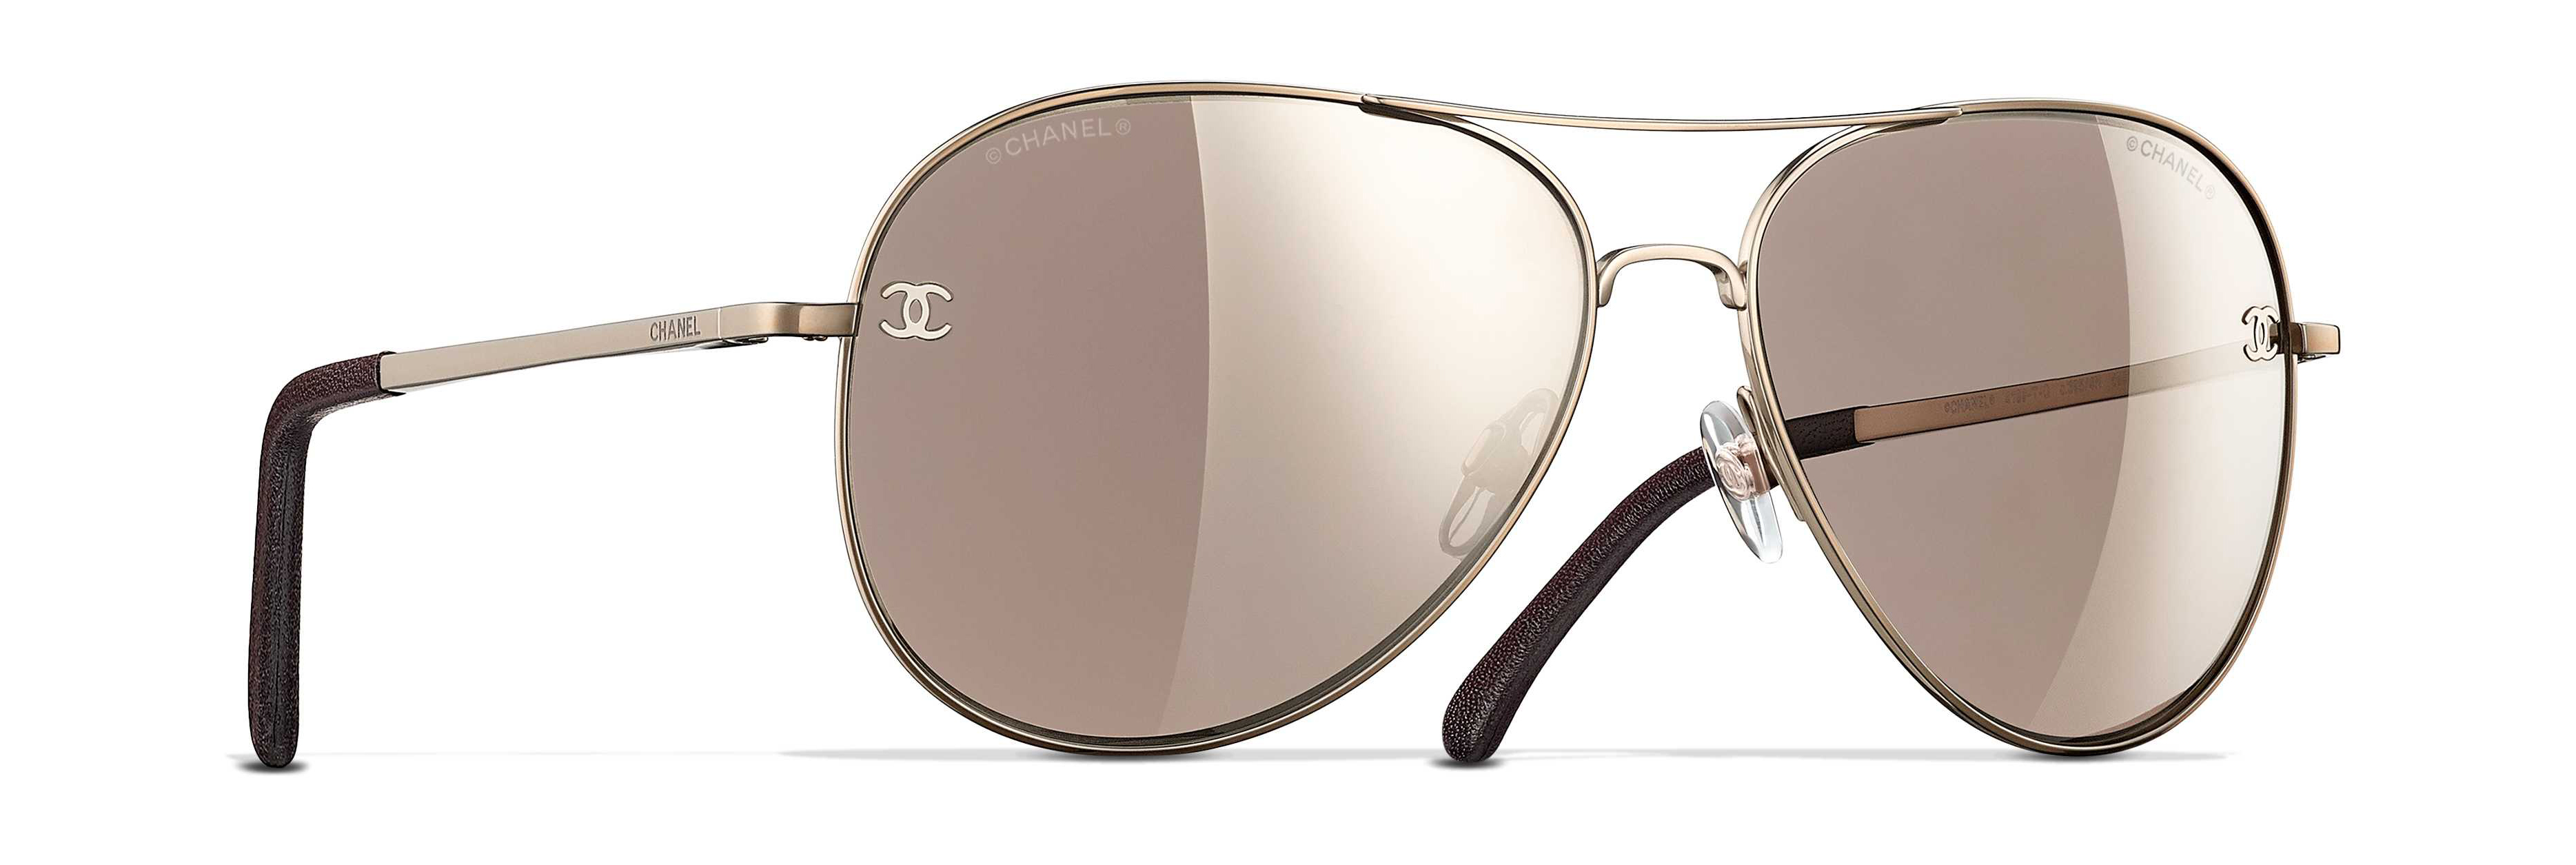 Sunglasses Women CHANEL CH 4189TQ C3956G 59/14